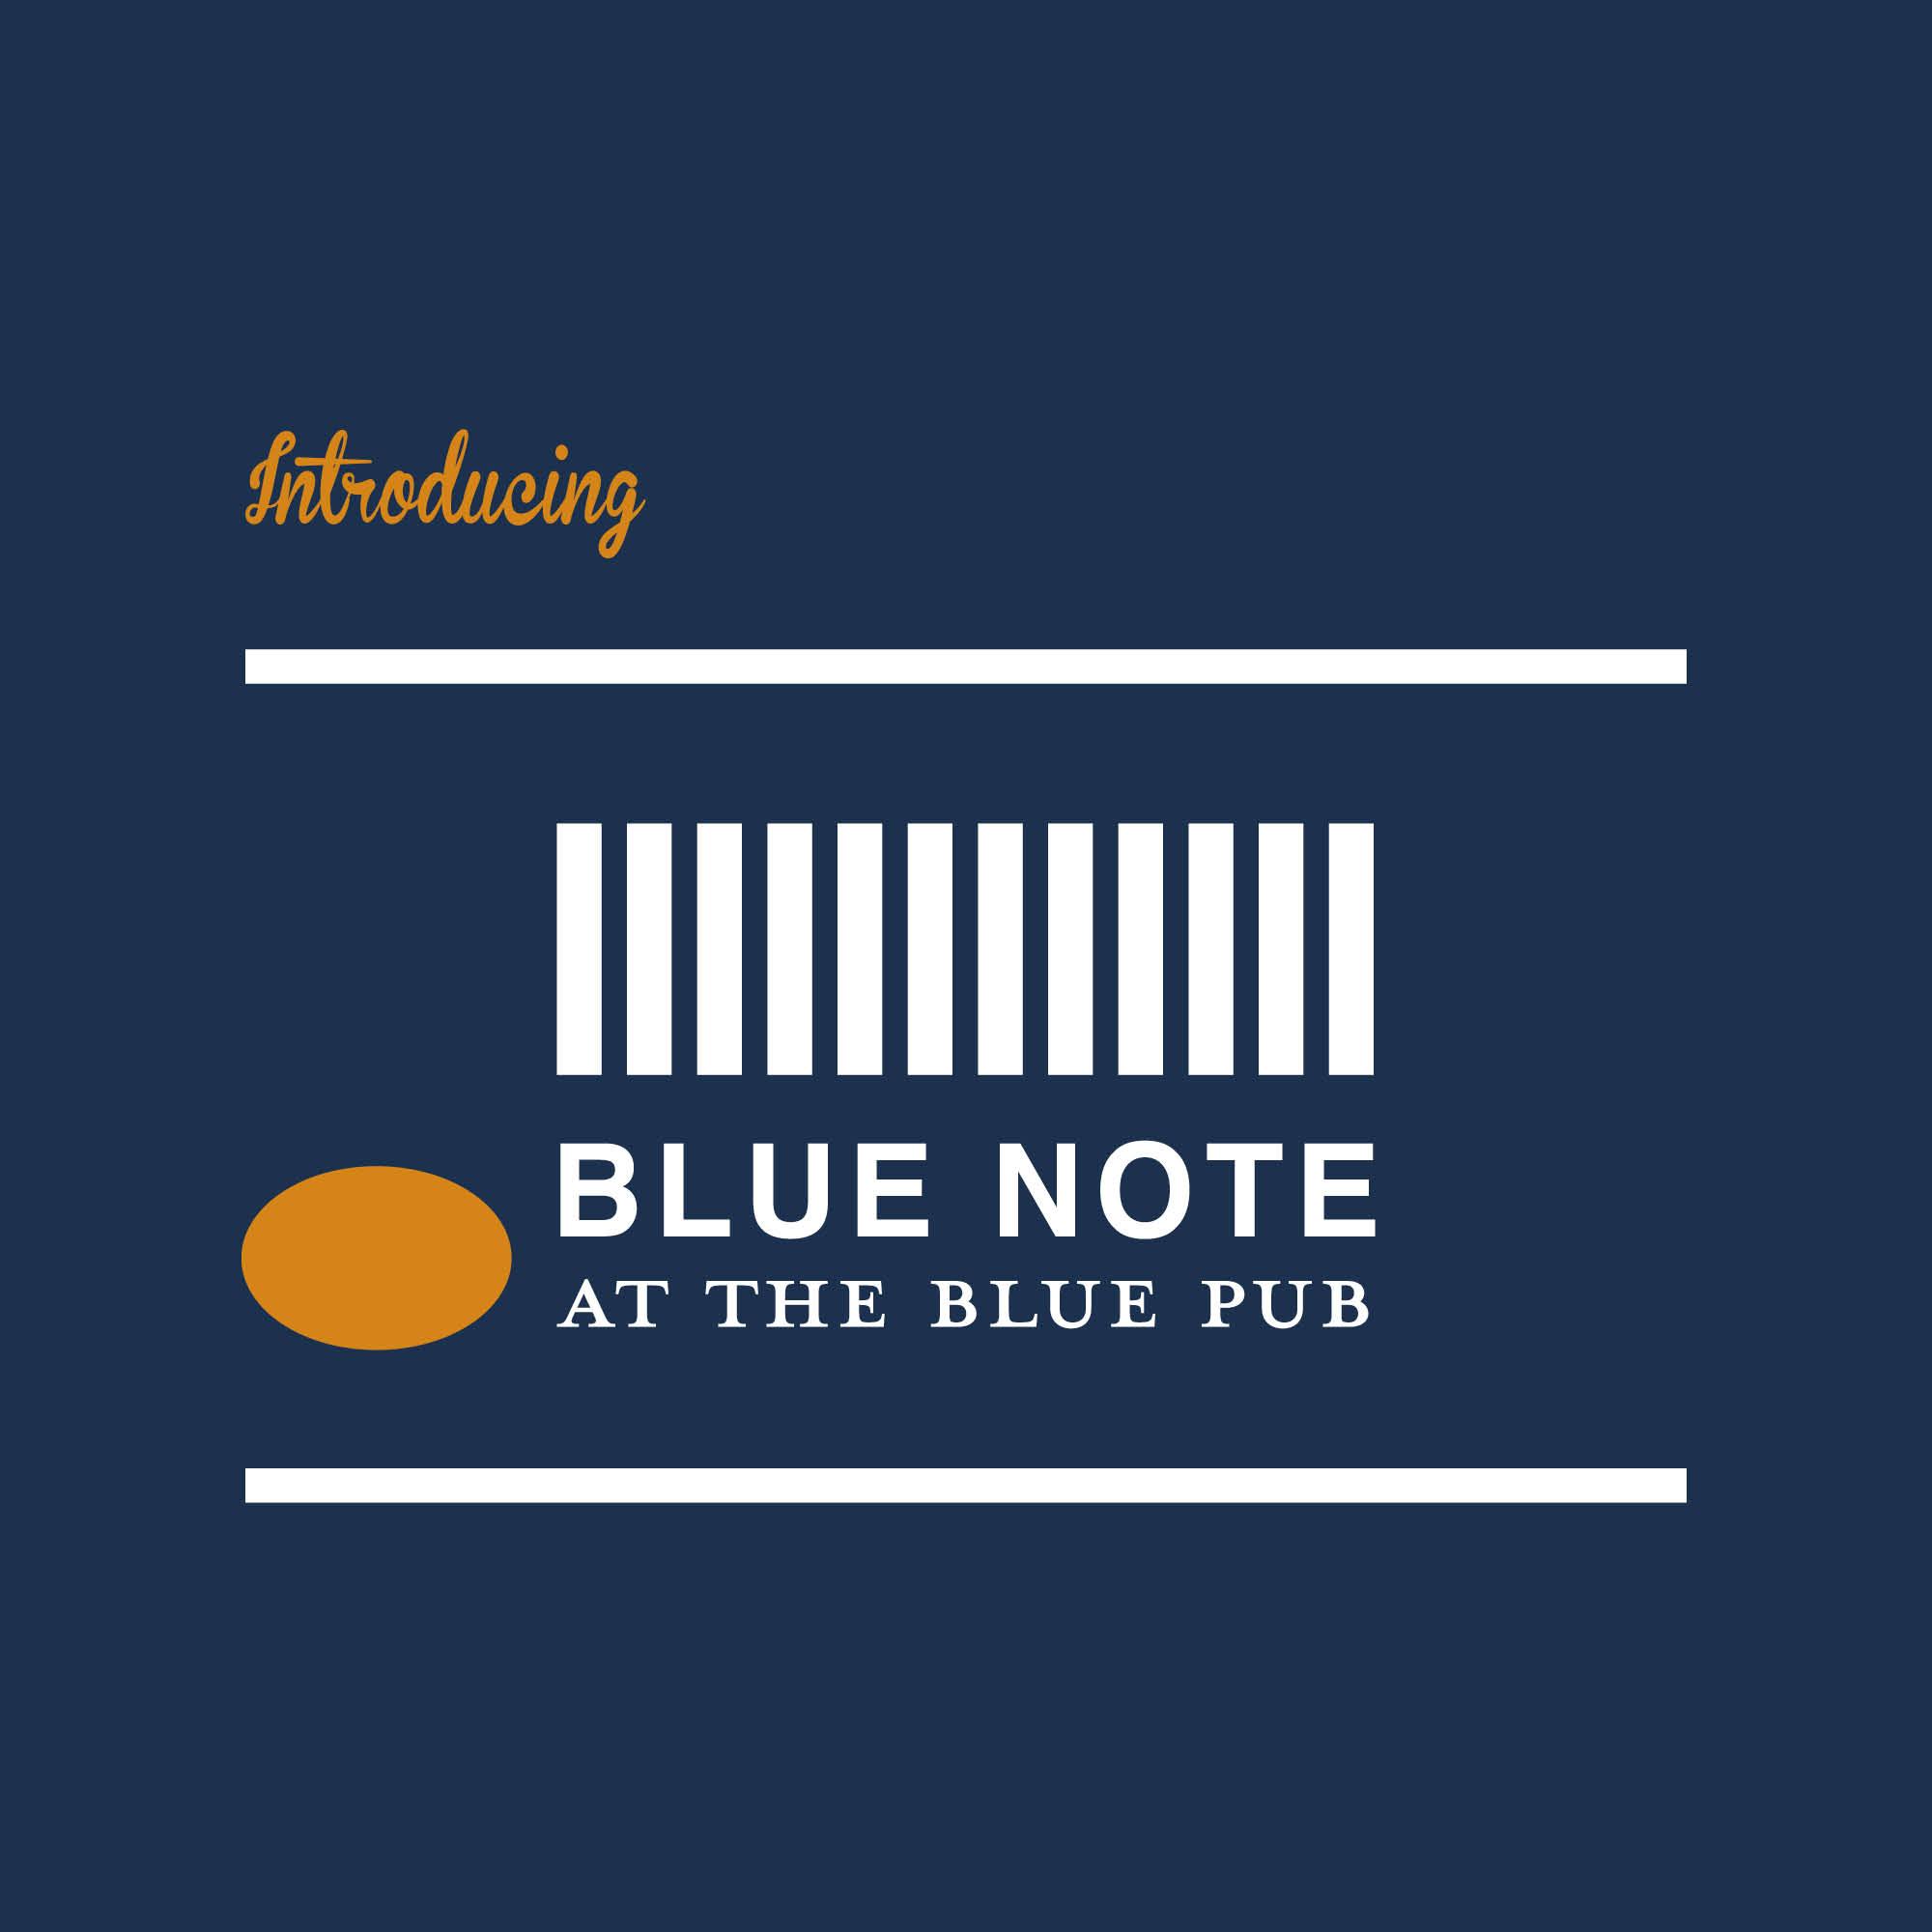 Facebook_July Blue Note.jpg